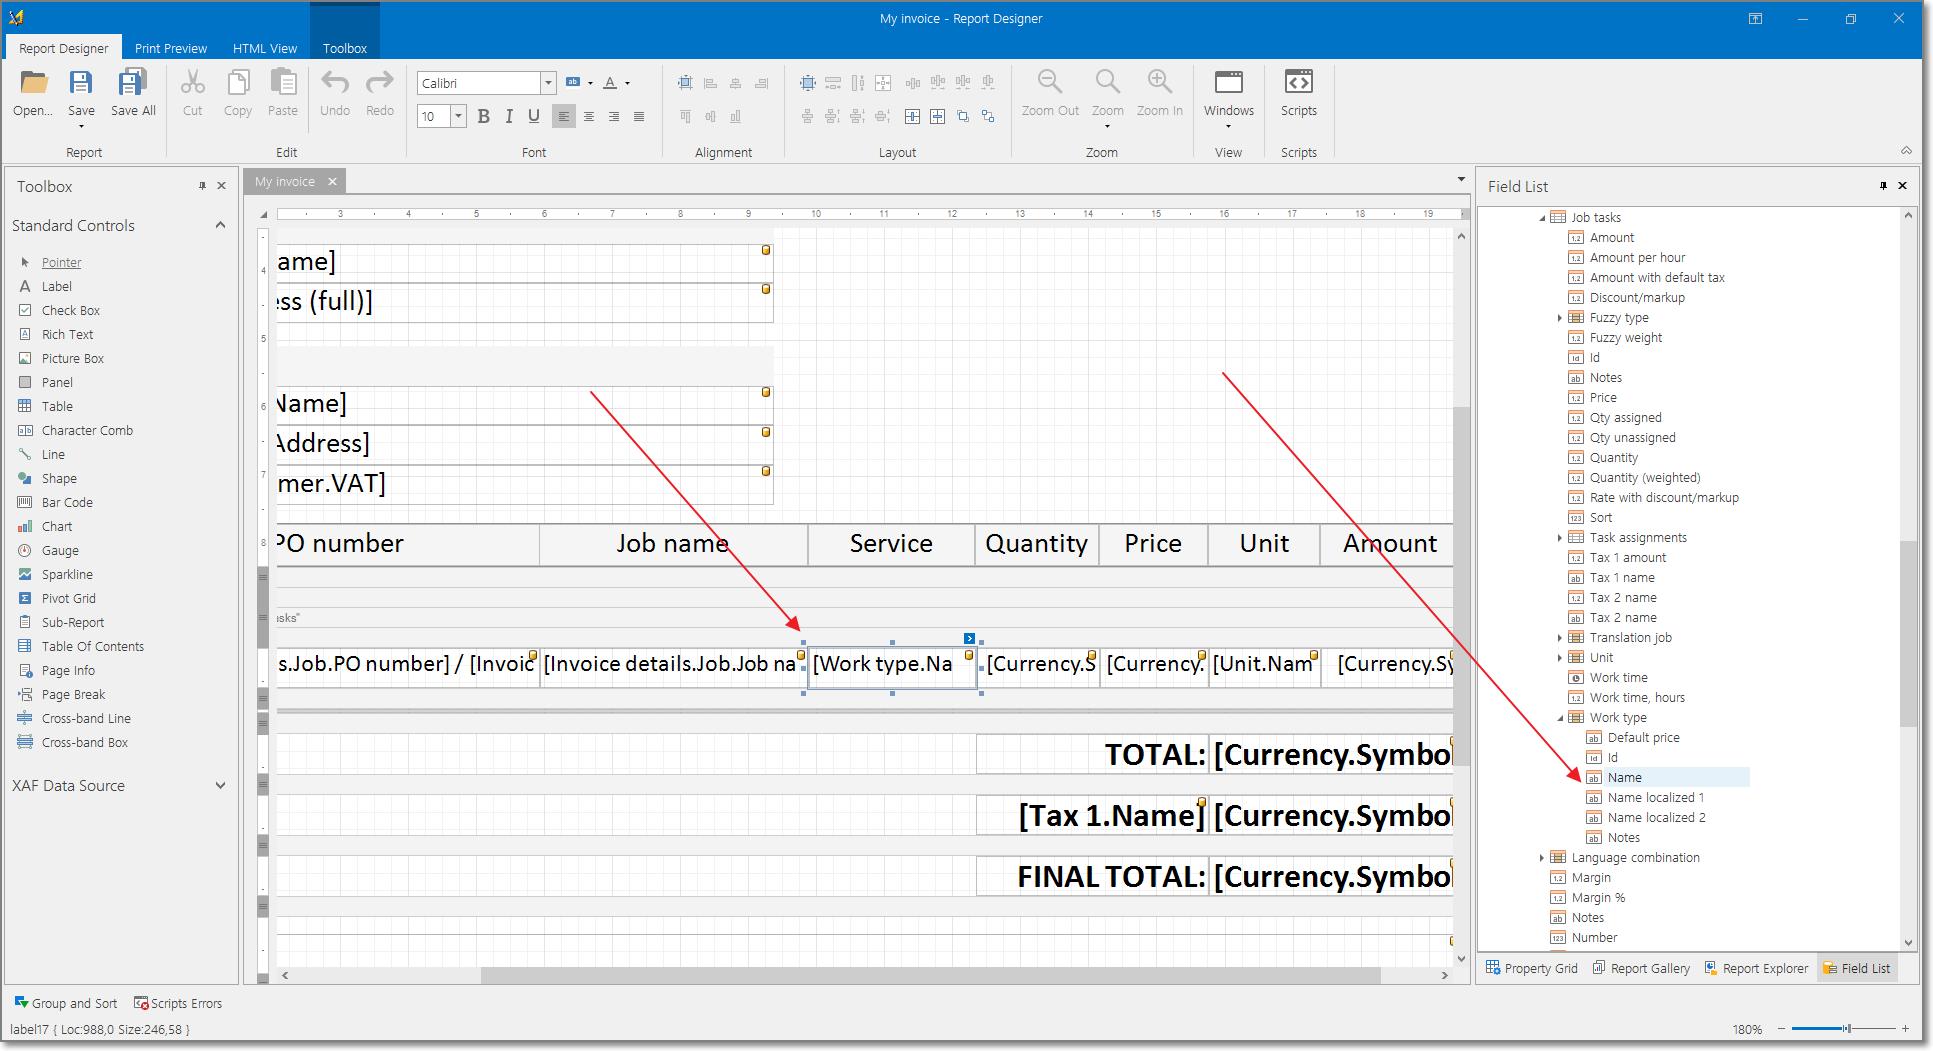 Invoice printing template localization, bilingual invoices